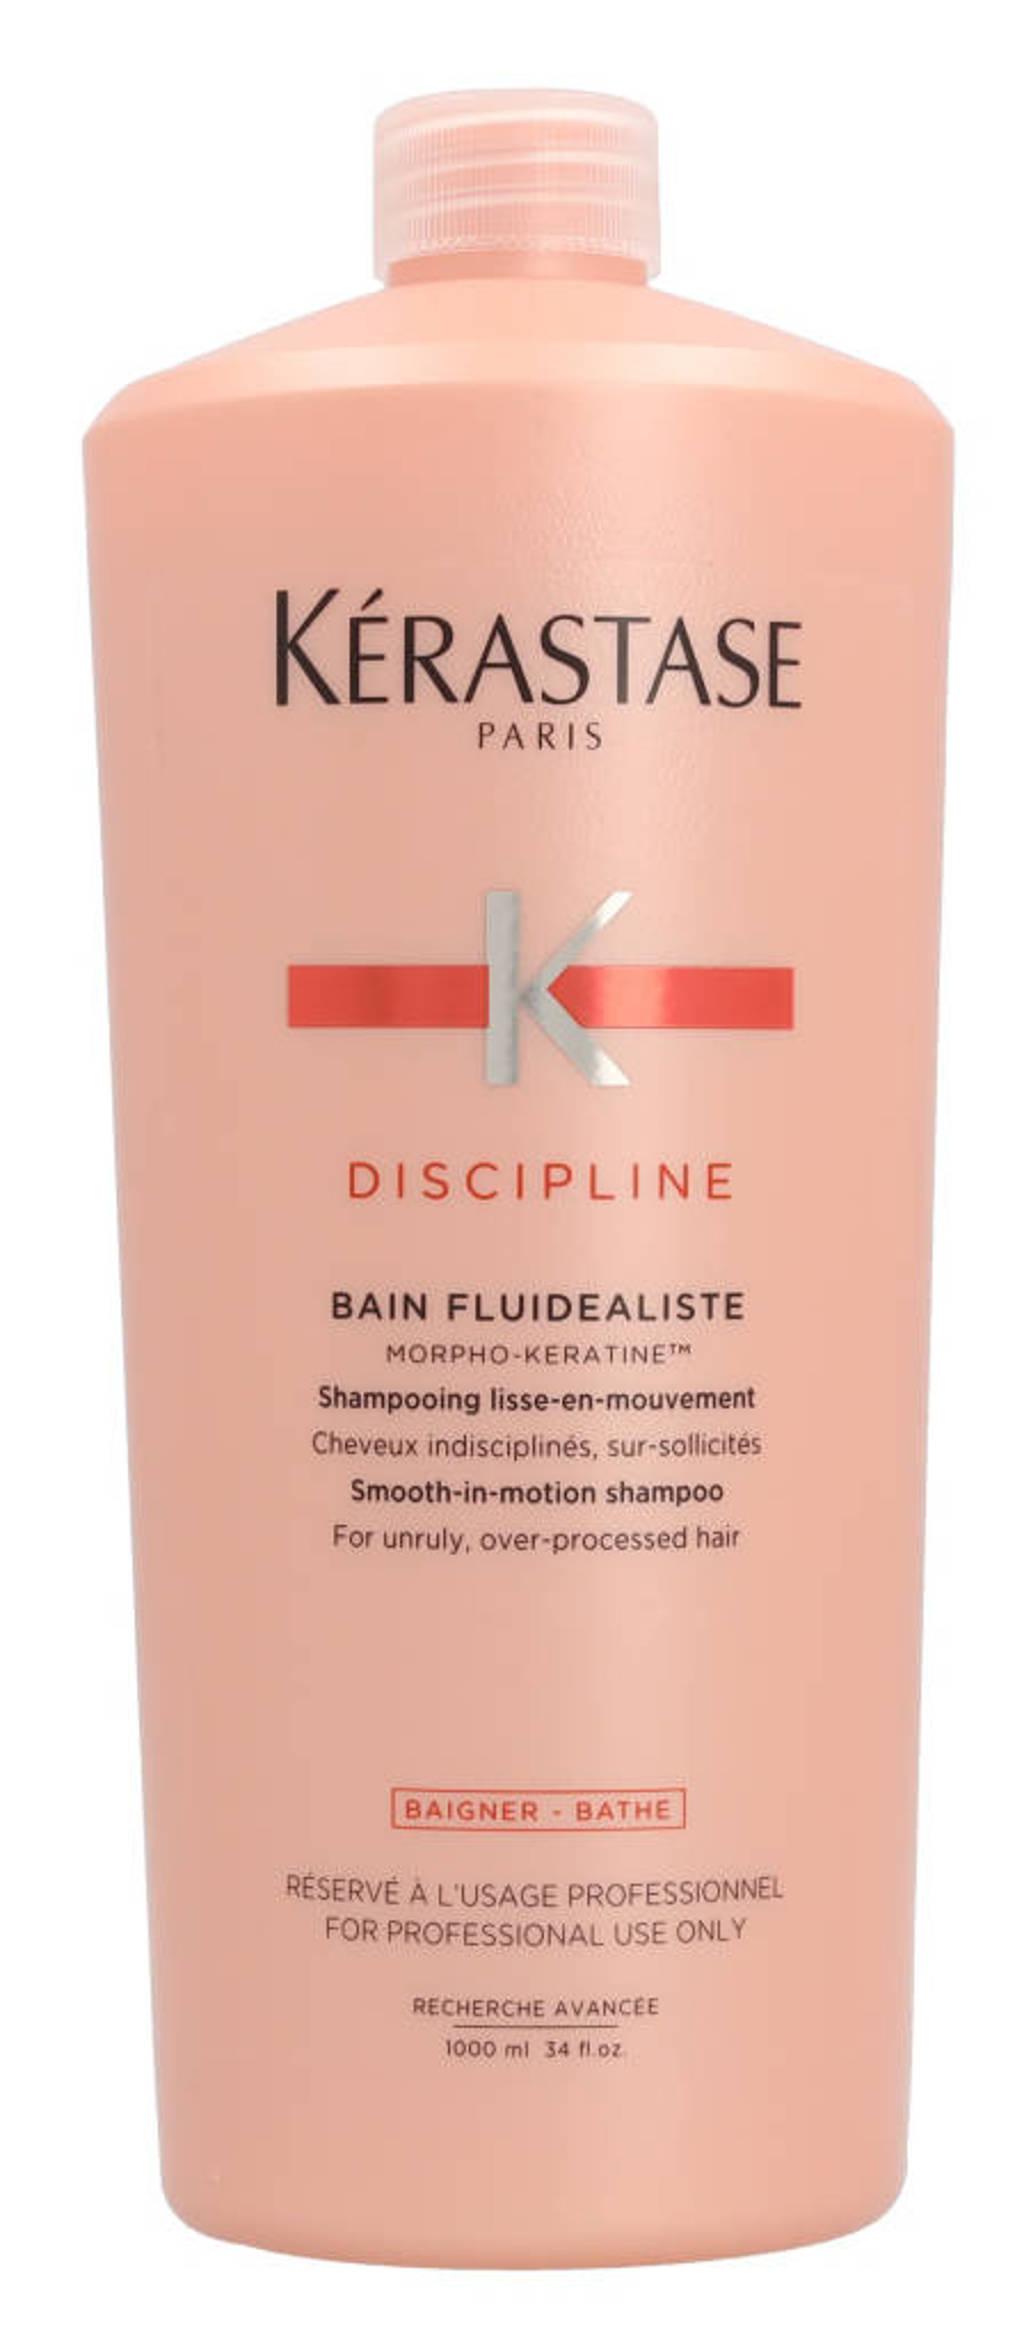 Kerastase Discipline Bain Fluidealiste Gentle Smooth-In-Motion shampoo - 1000 ml